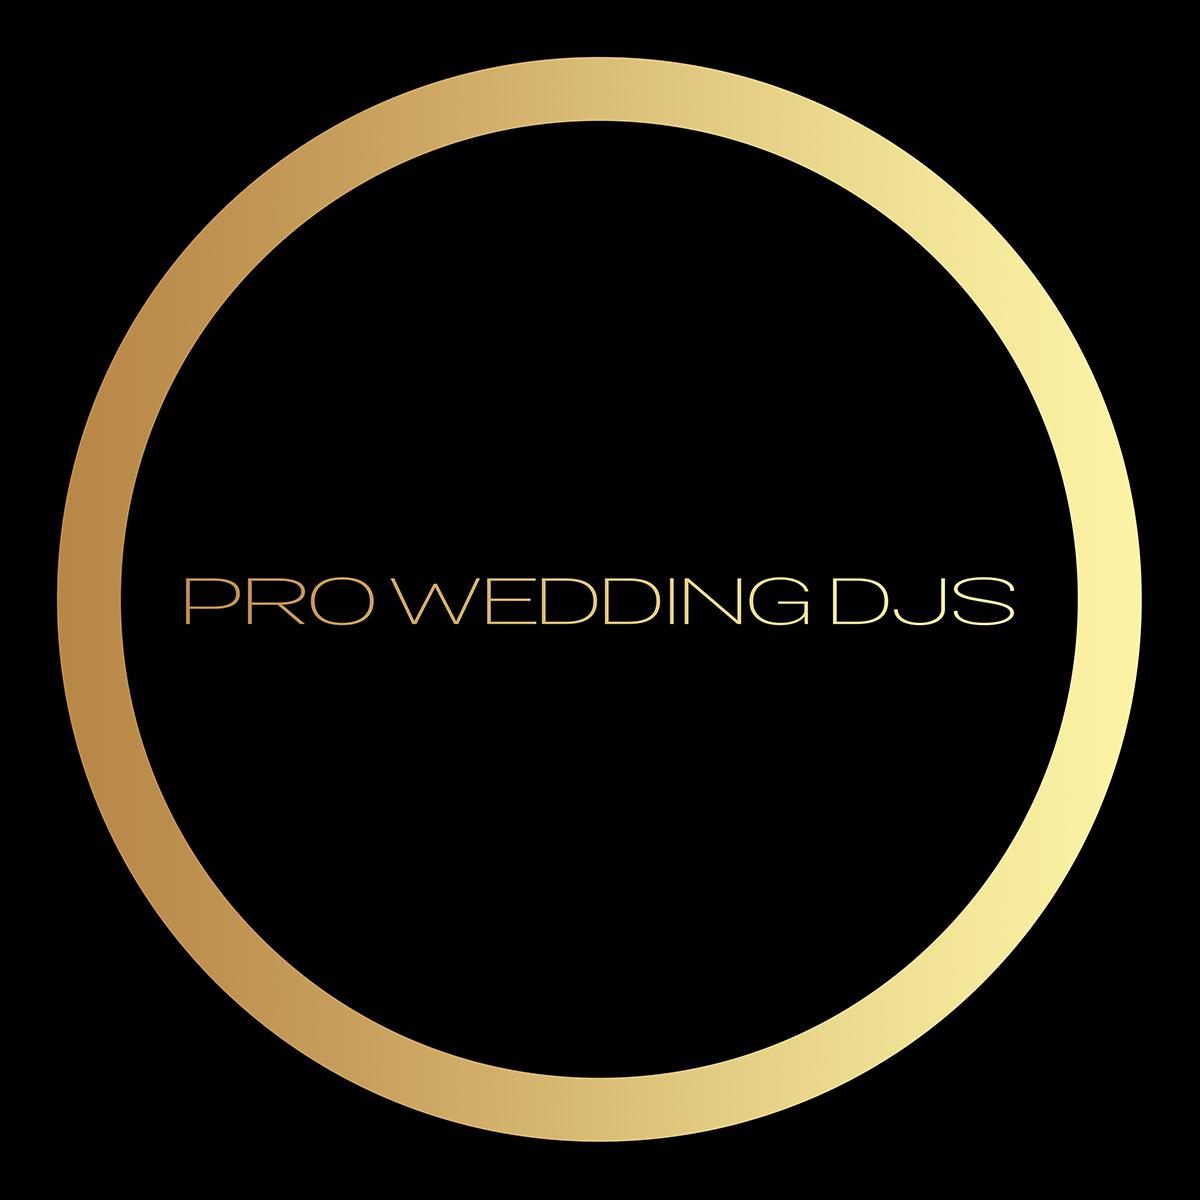 Pro Wedding DJS